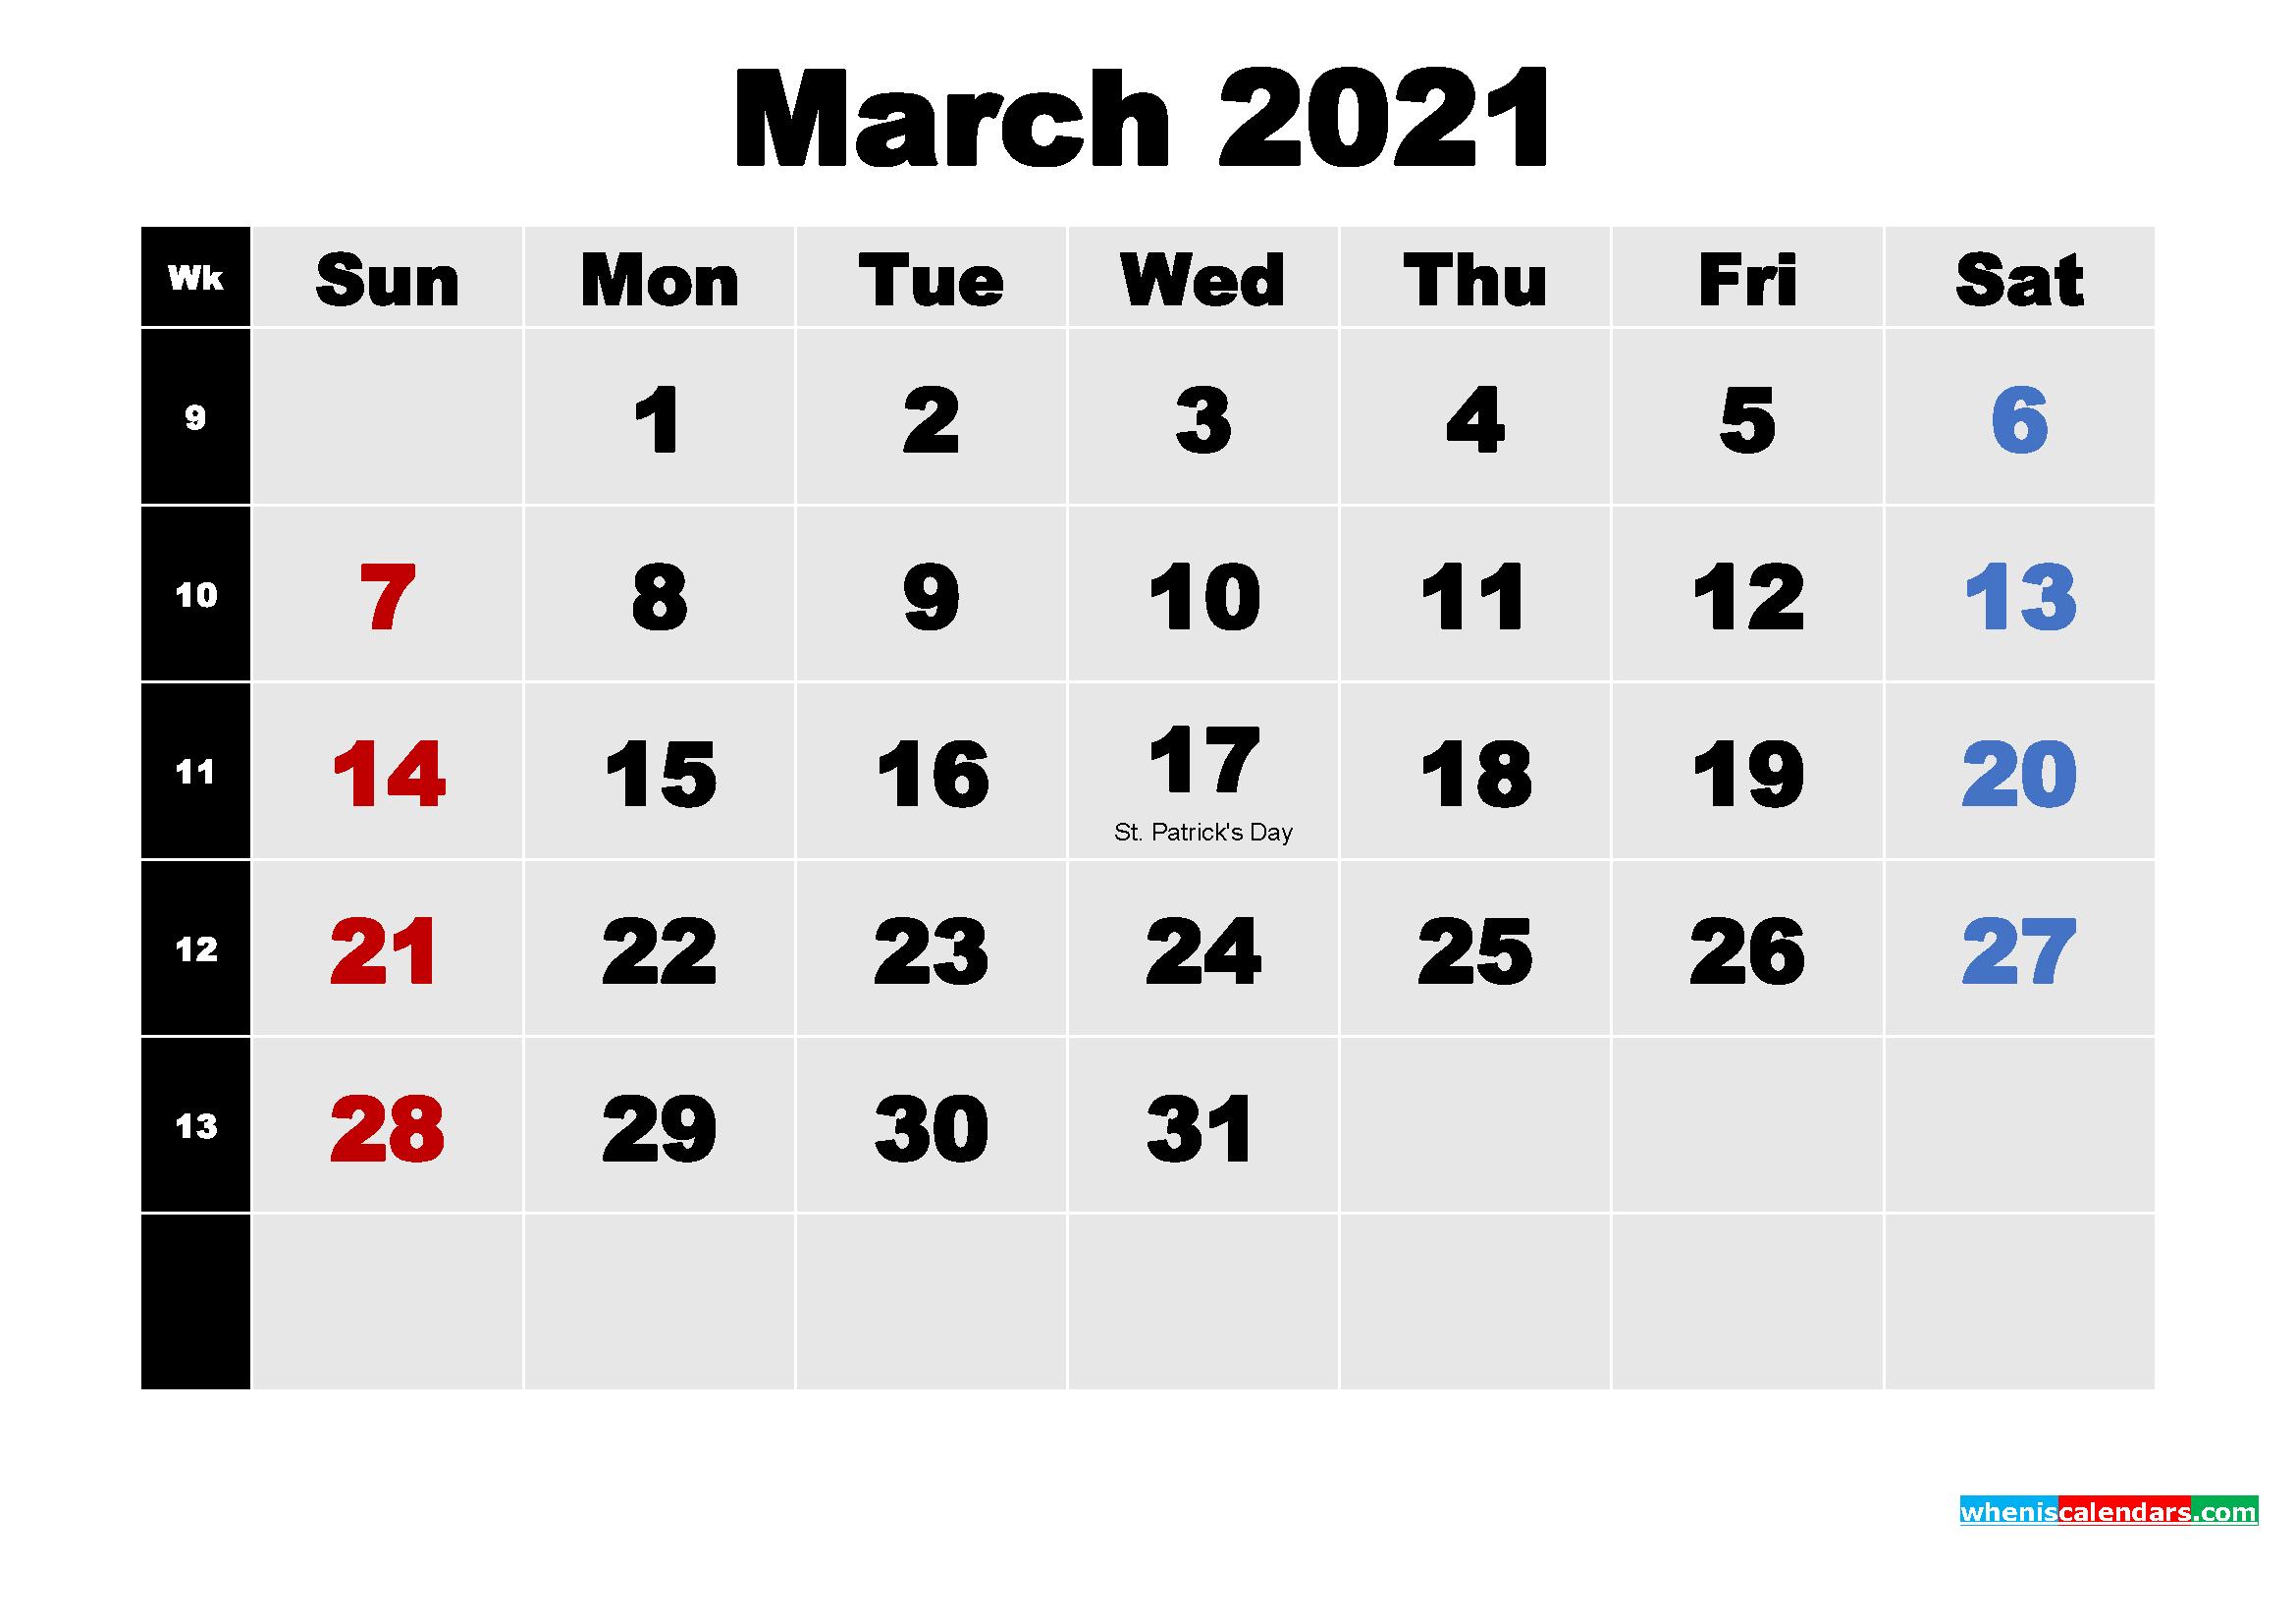 Free March 2021 Printable Calendar Template Word, Pdf